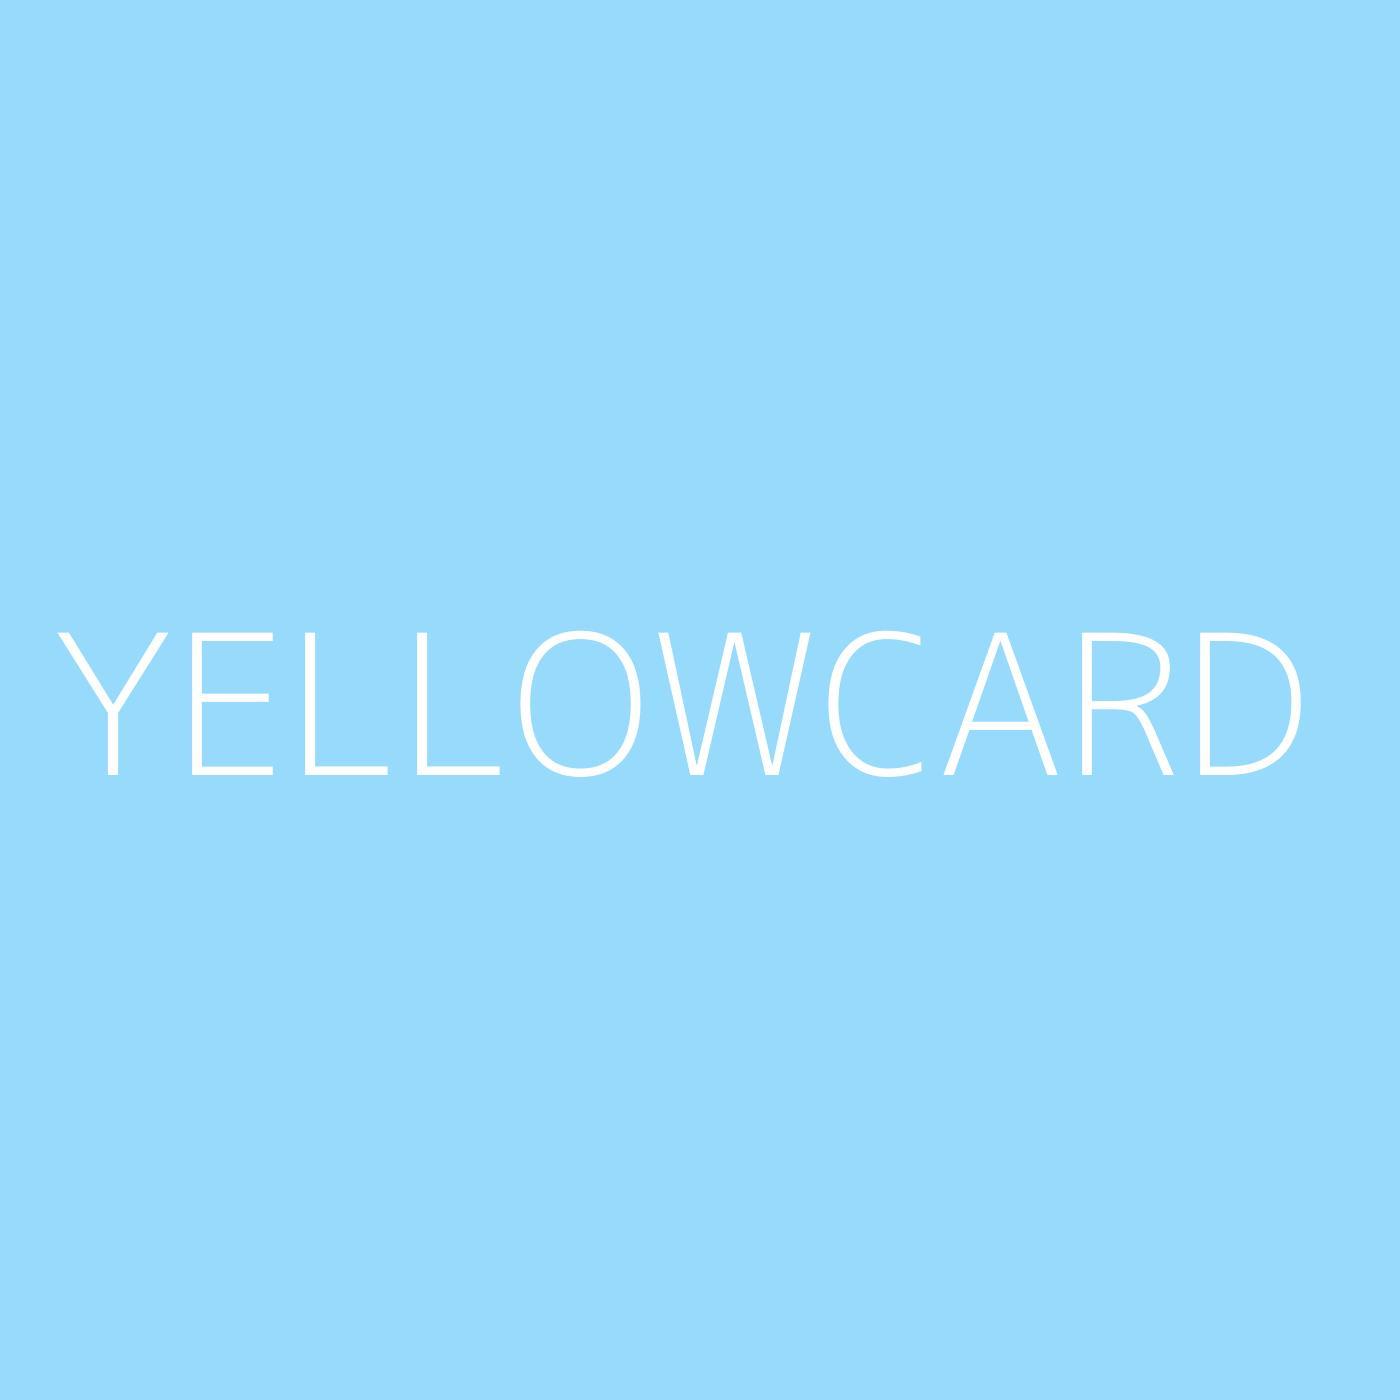 Yellowcard Playlist Artwork